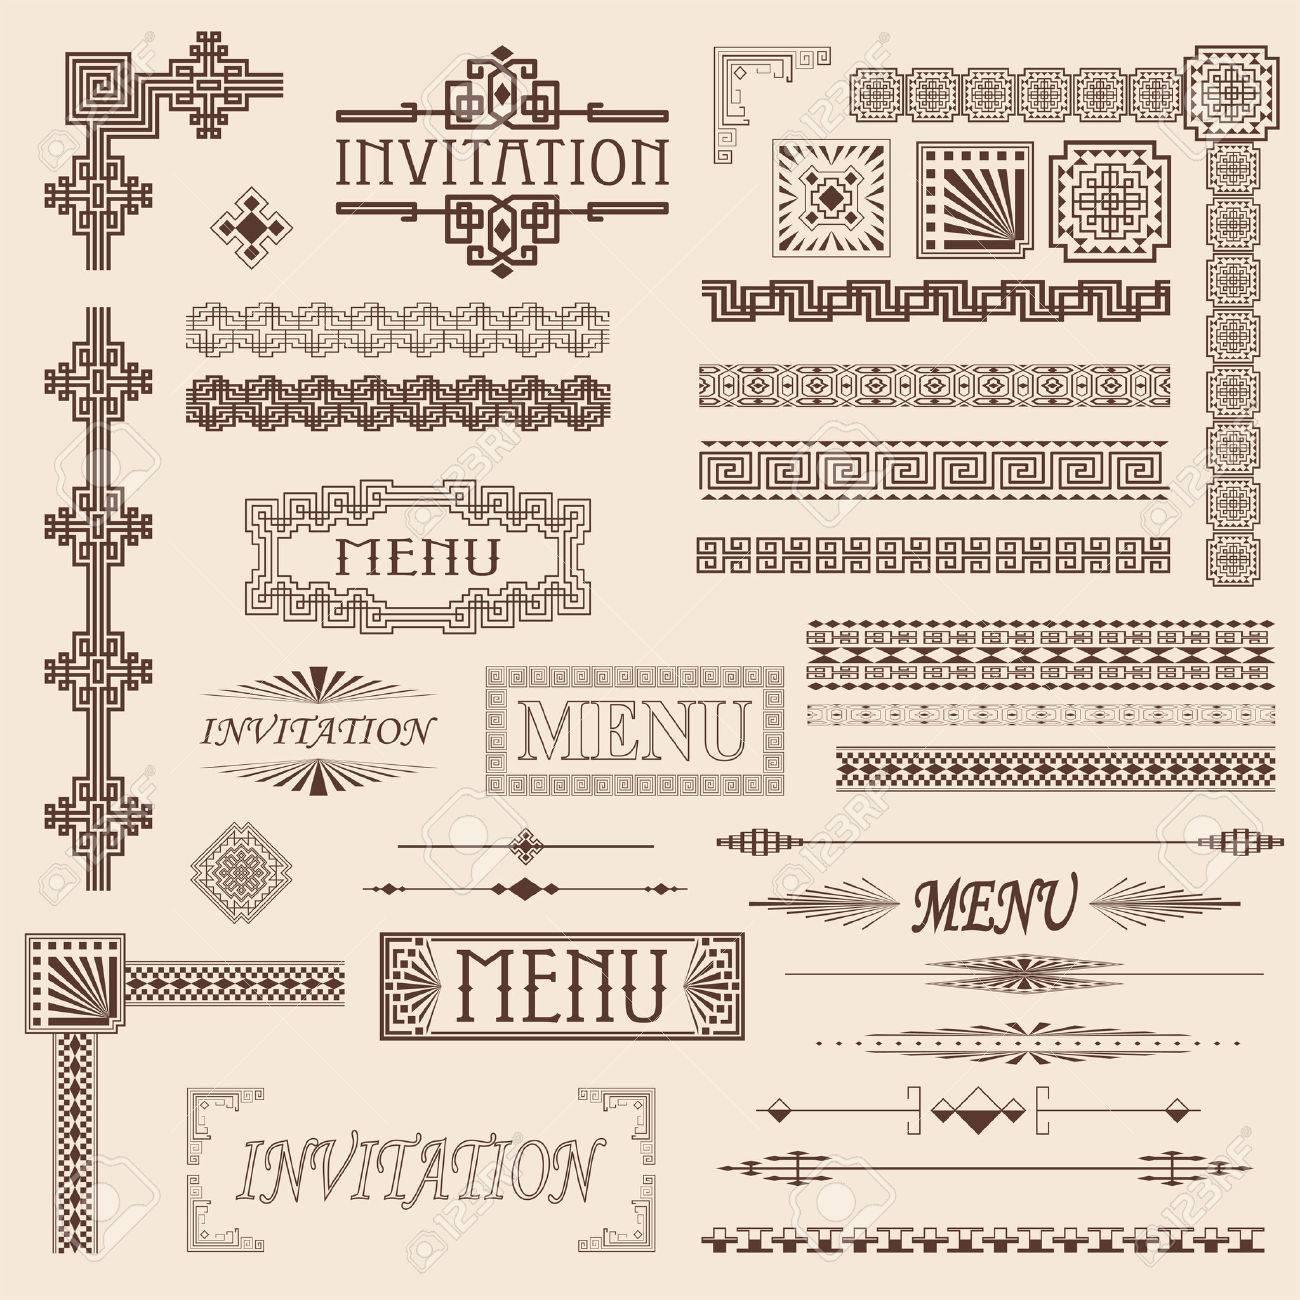 Decorative menu and invitation border elements royalty free cliparts decorative menu and invitation border elements stock vector 8984758 stopboris Choice Image